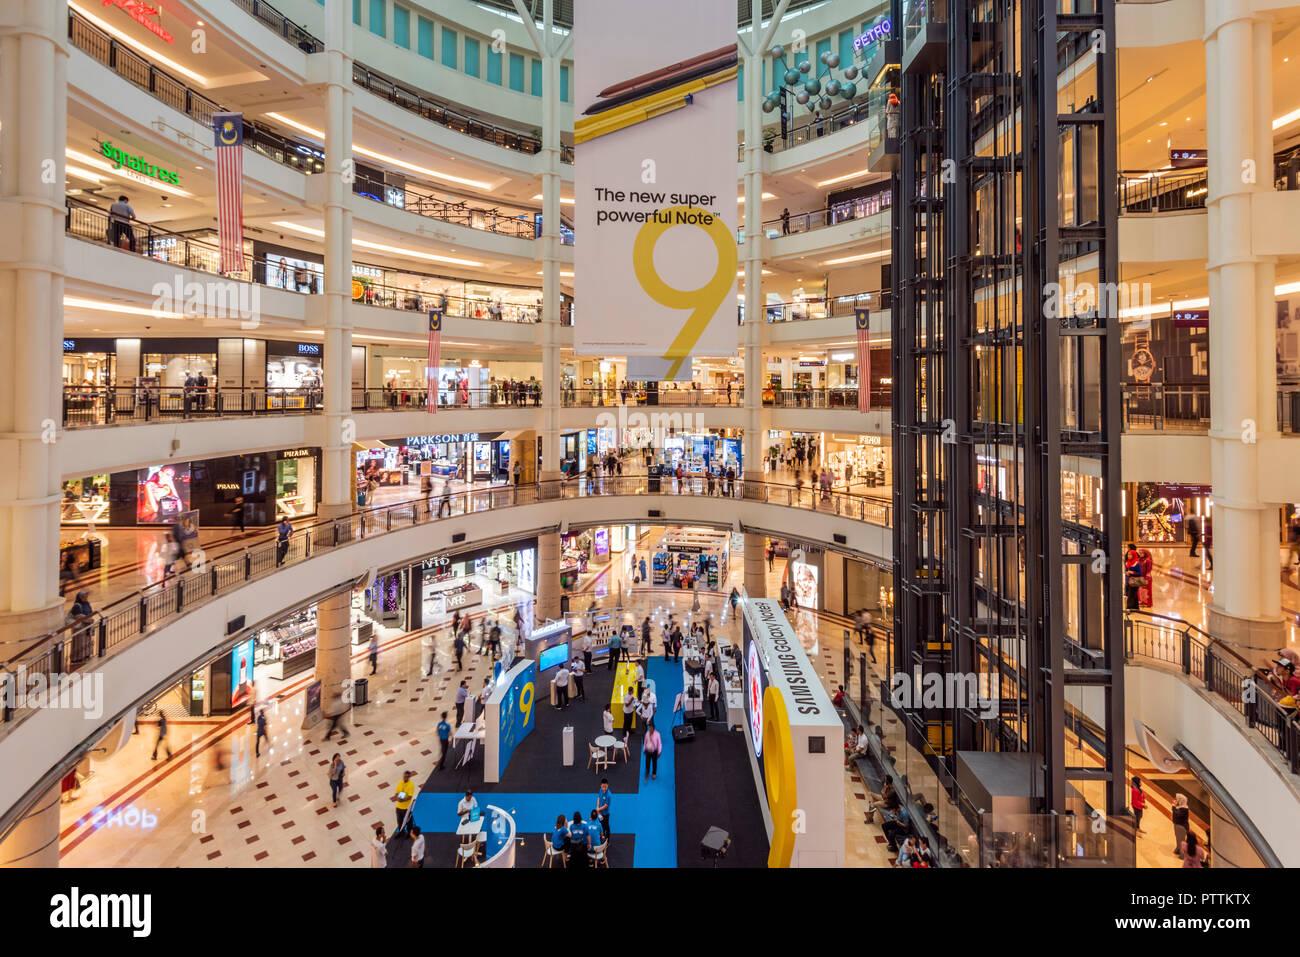 Suria KLCC shopping center, Kuala Lumpur, Malaysia - Stock Image